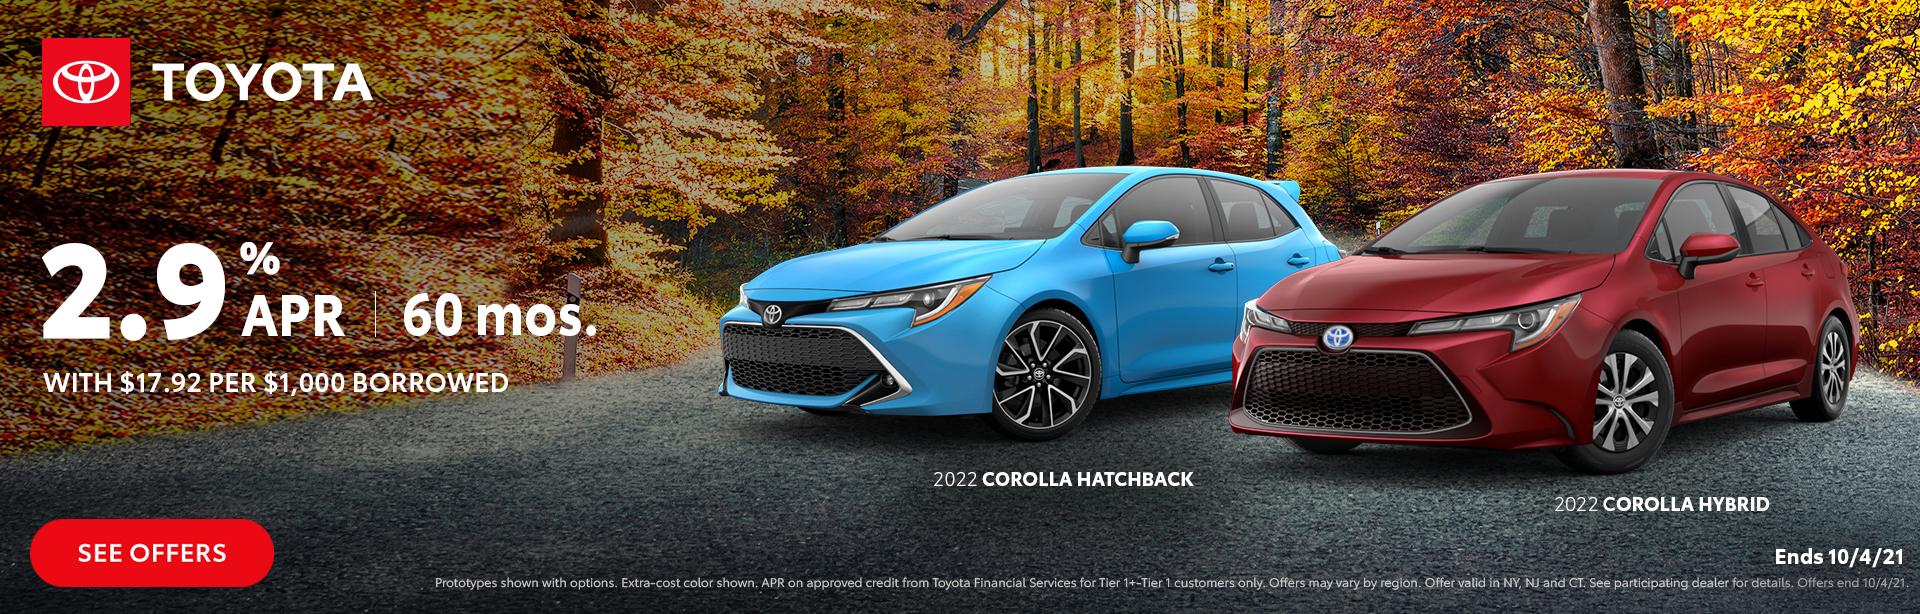 09-21_01_Greater-New-York-Up-State-Connecticut-September-2021-GNY-UNY-CT-Corolla_1920x614_9237_Corolla-Corolla-Hatchback-Corolla-Hybrid_R_xta.jpeg